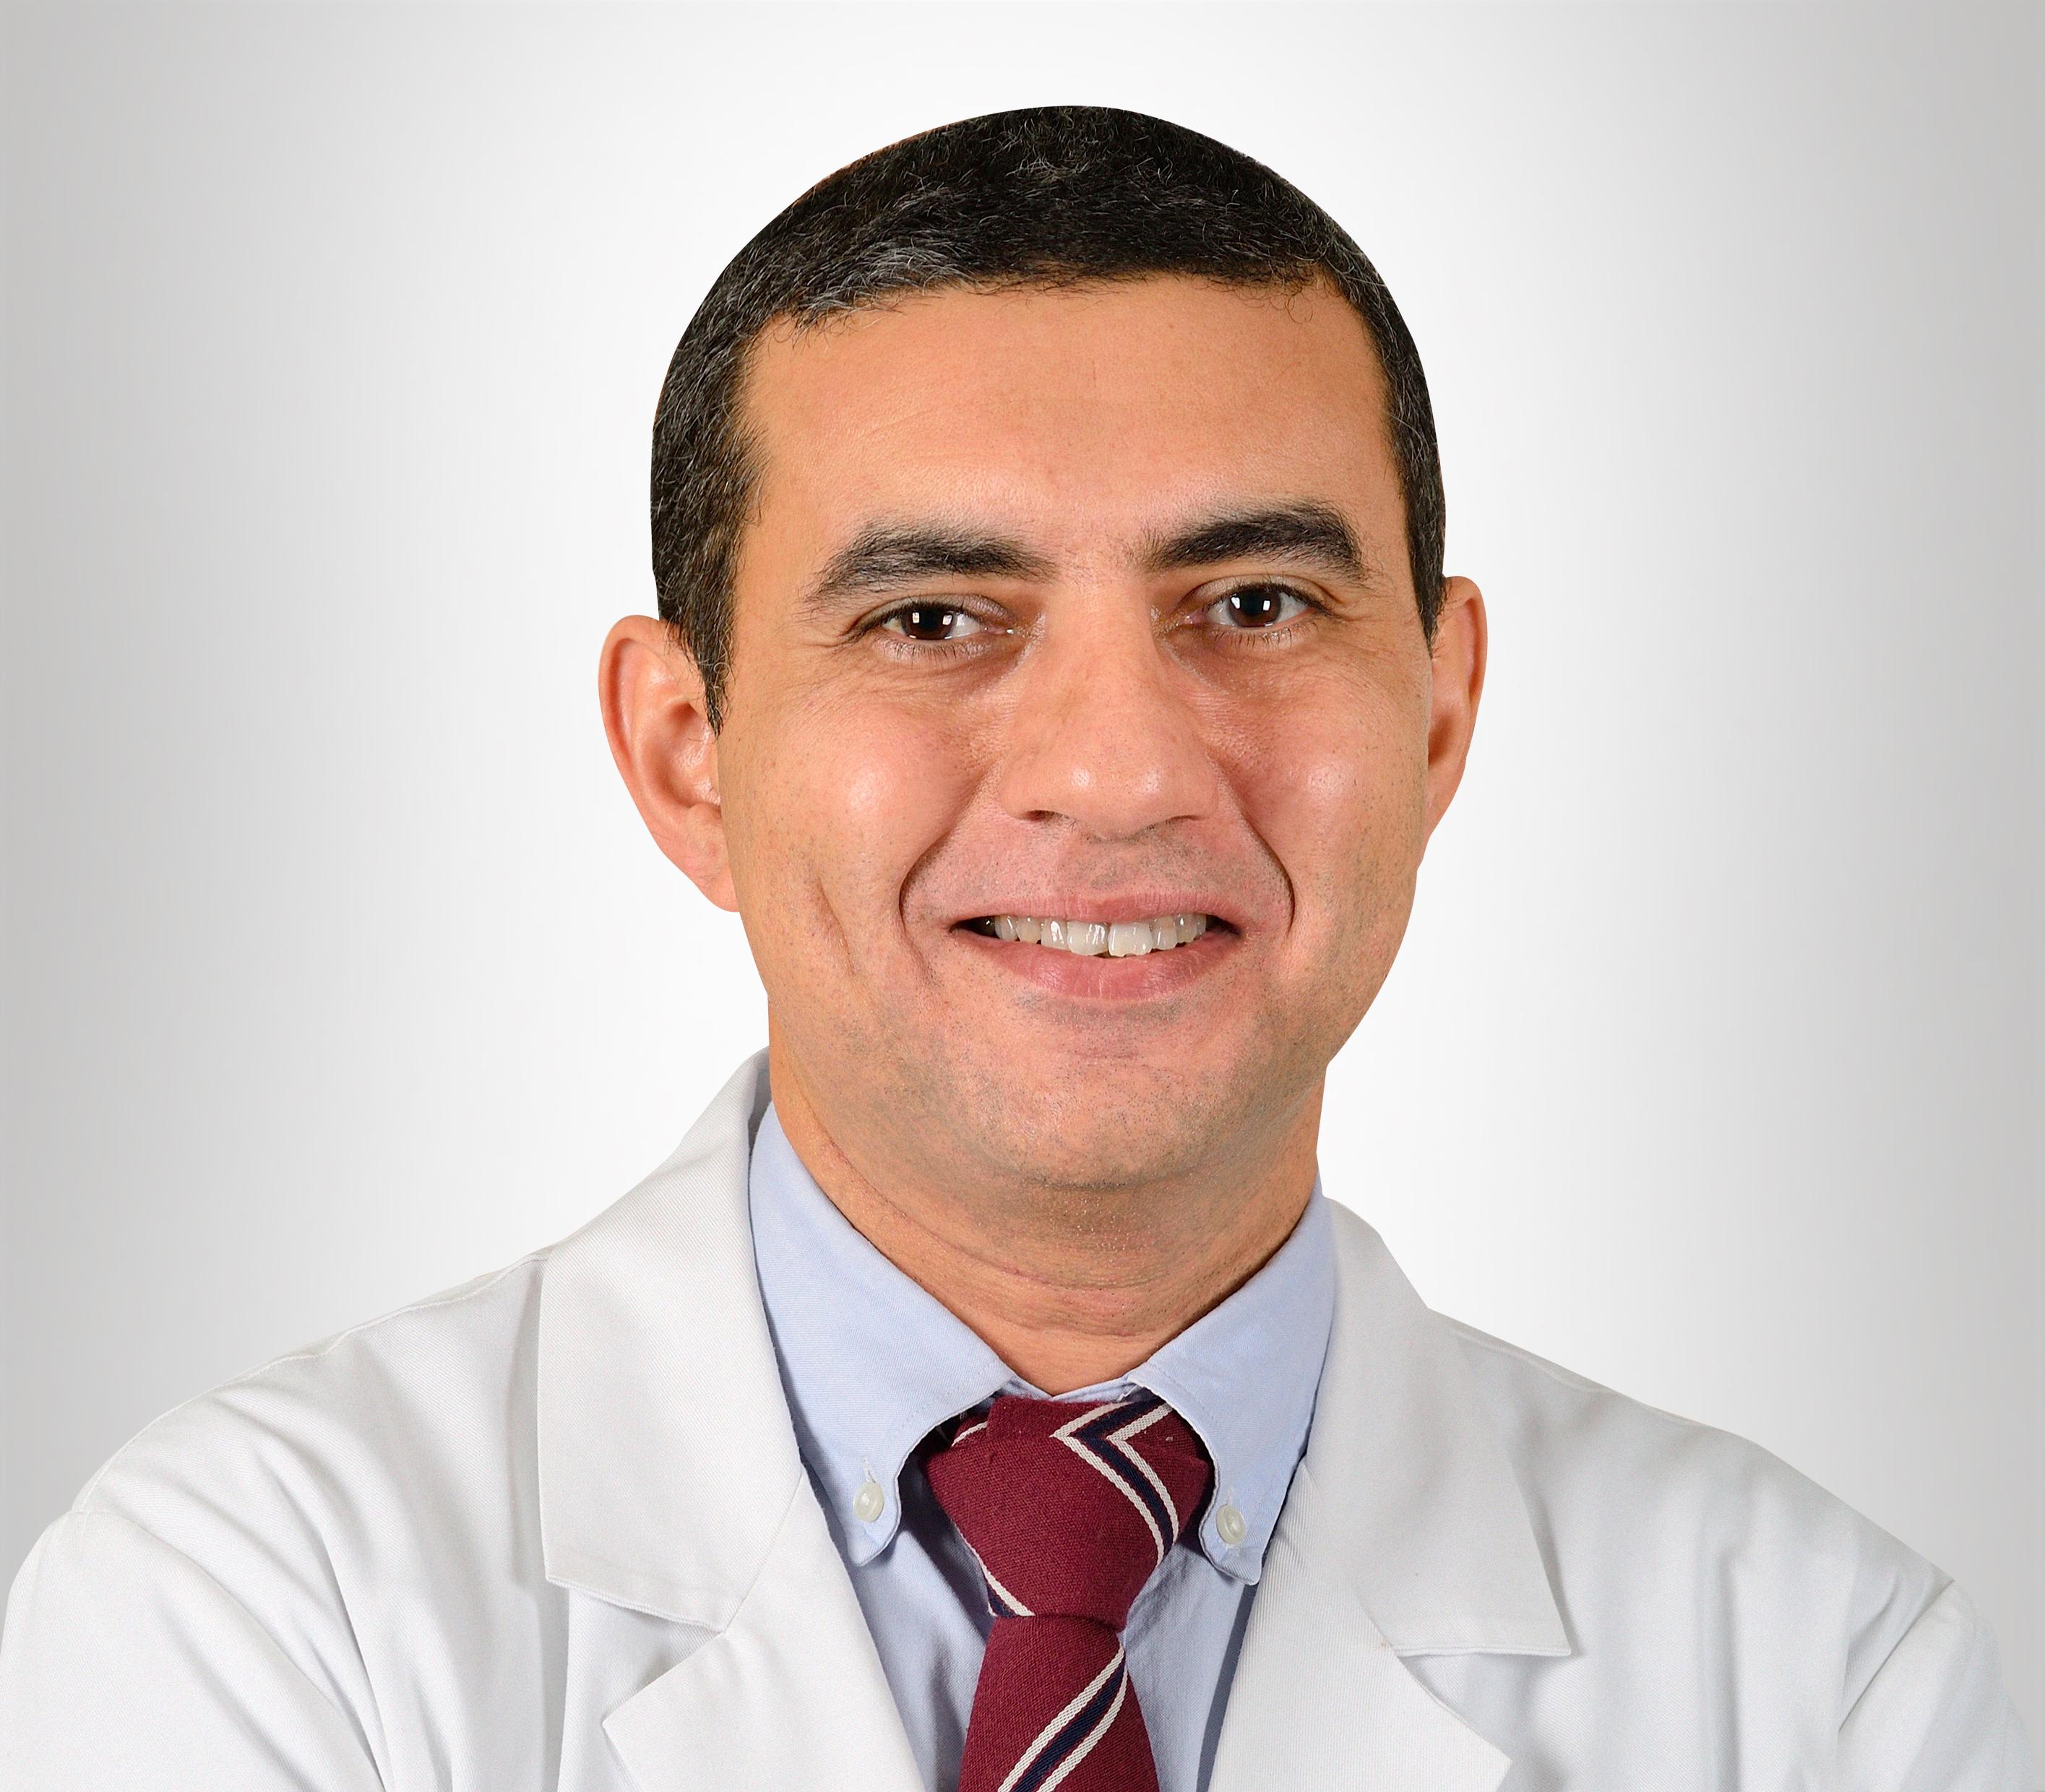 Mohamed El Gharib